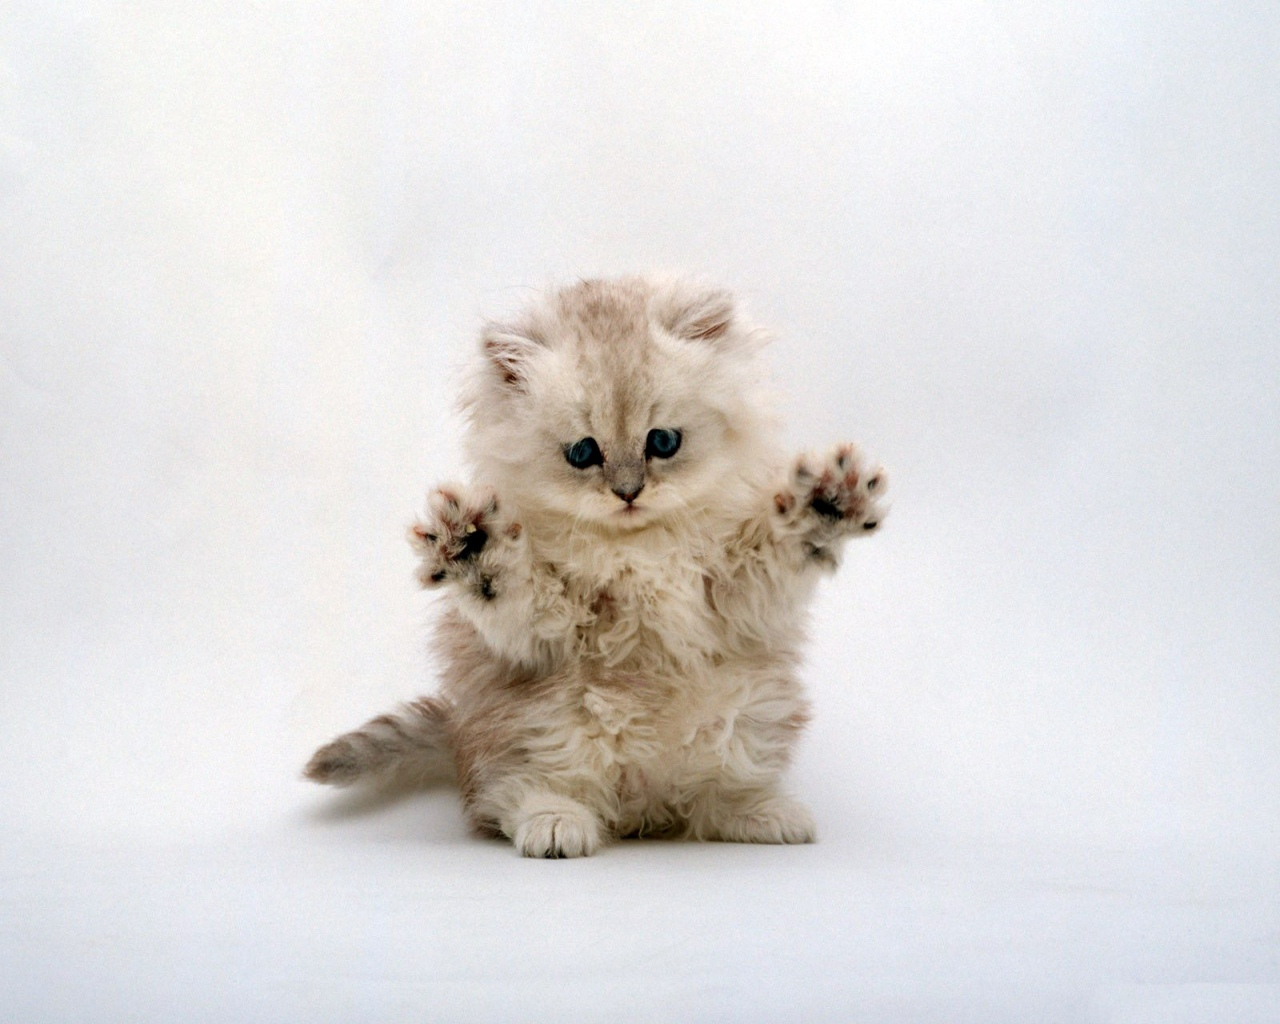 https://3.bp.blogspot.com/_SWYwL3fIkFs/S71rtc3GrvI/AAAAAAAAEG0/5rQ_osUs0Iw/s1600/cute+cat.jpg